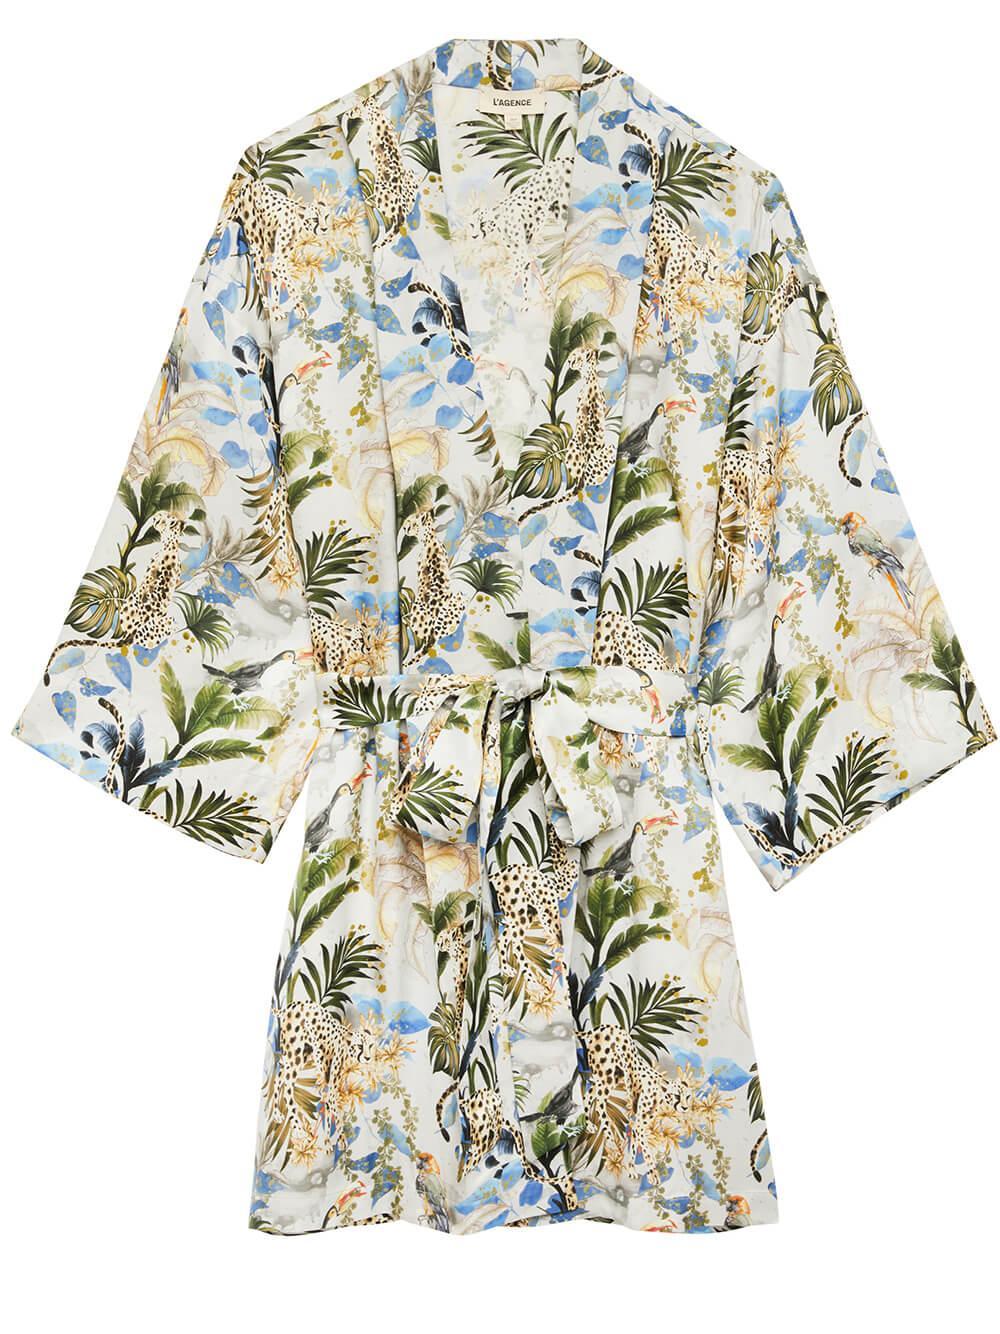 Hayden Printed Kimono Item # 1605PPL